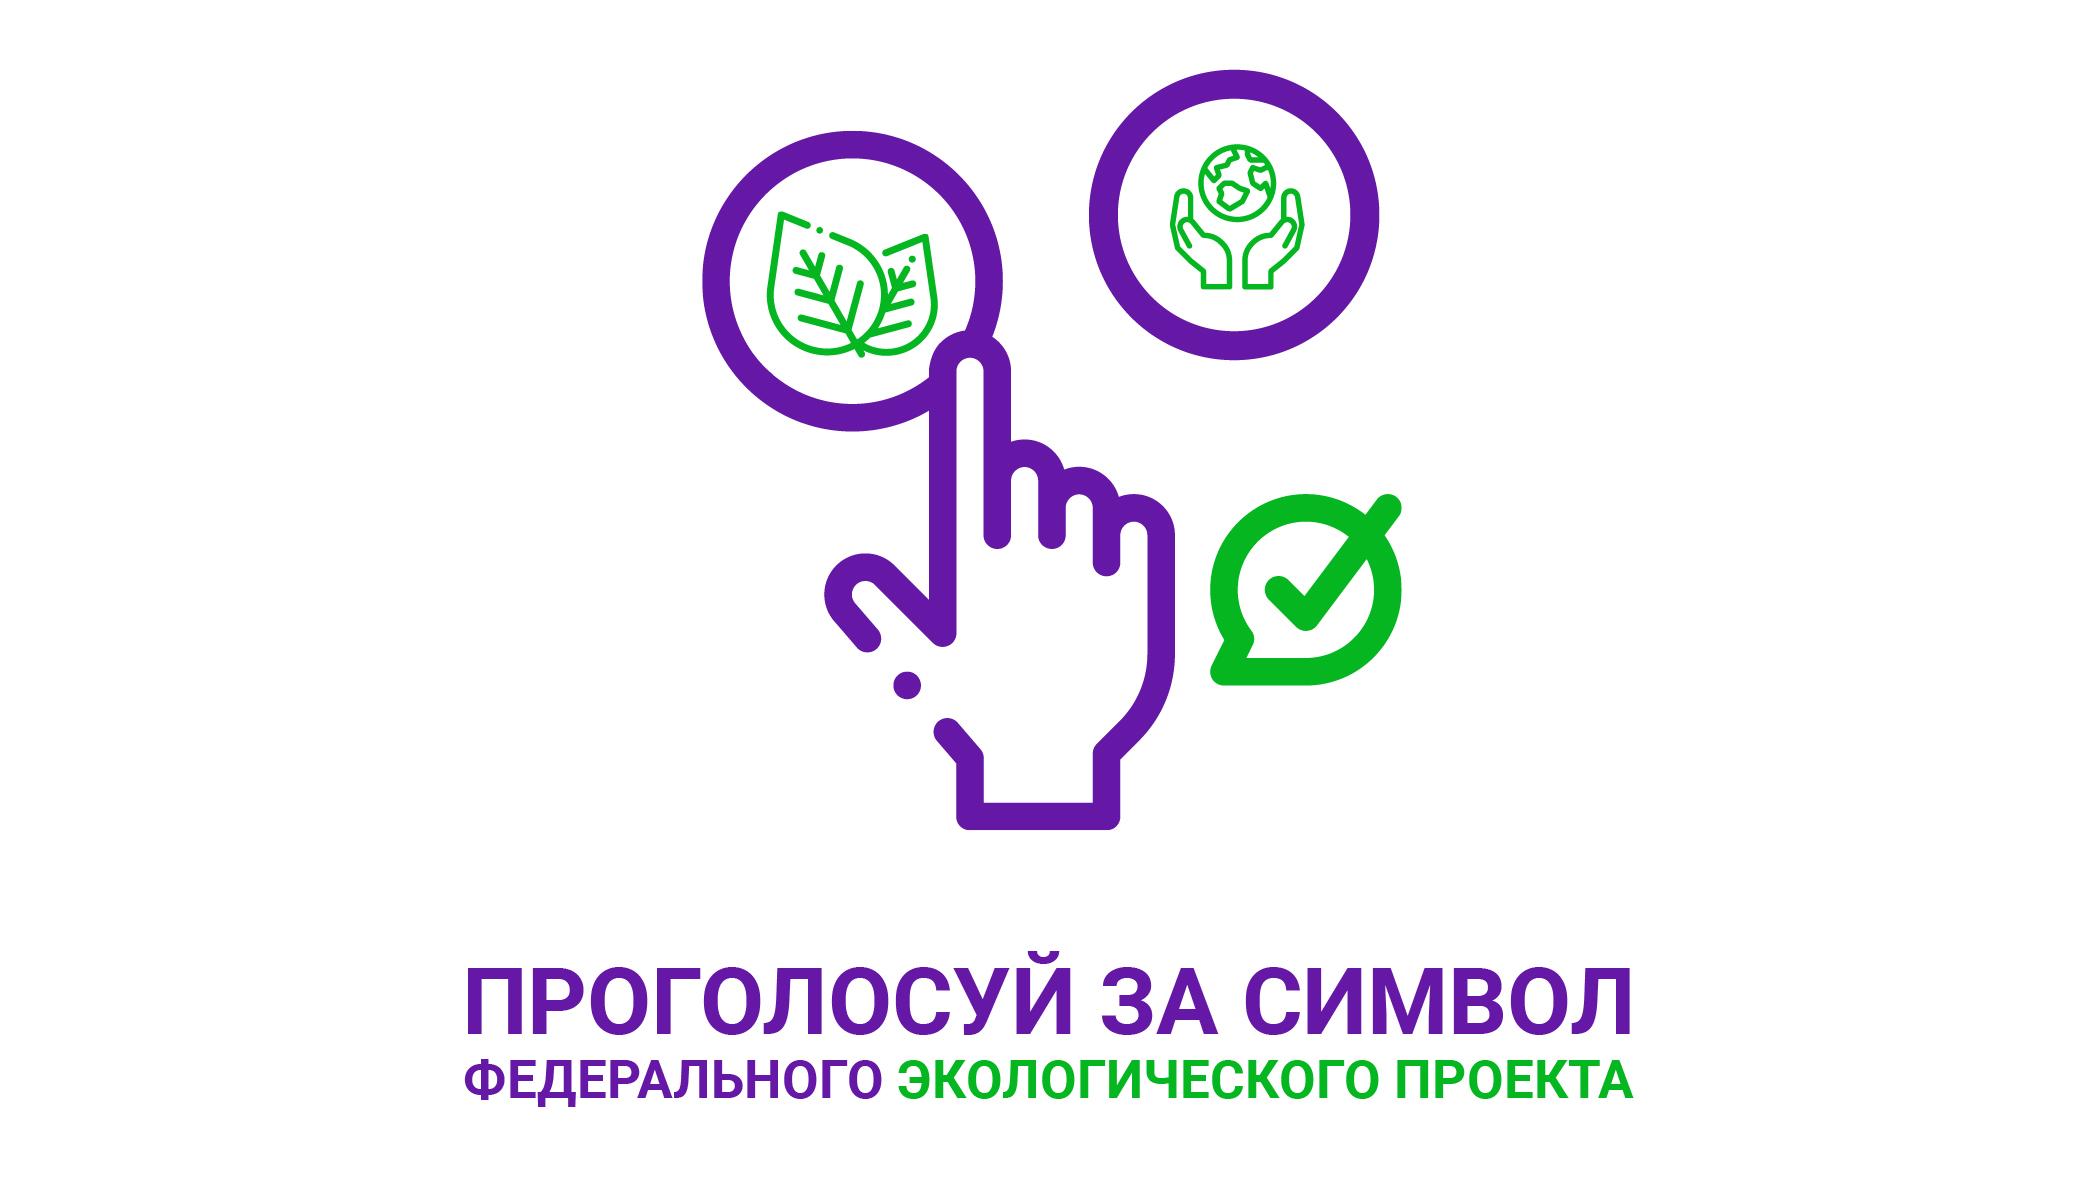 Проголосуй за символ